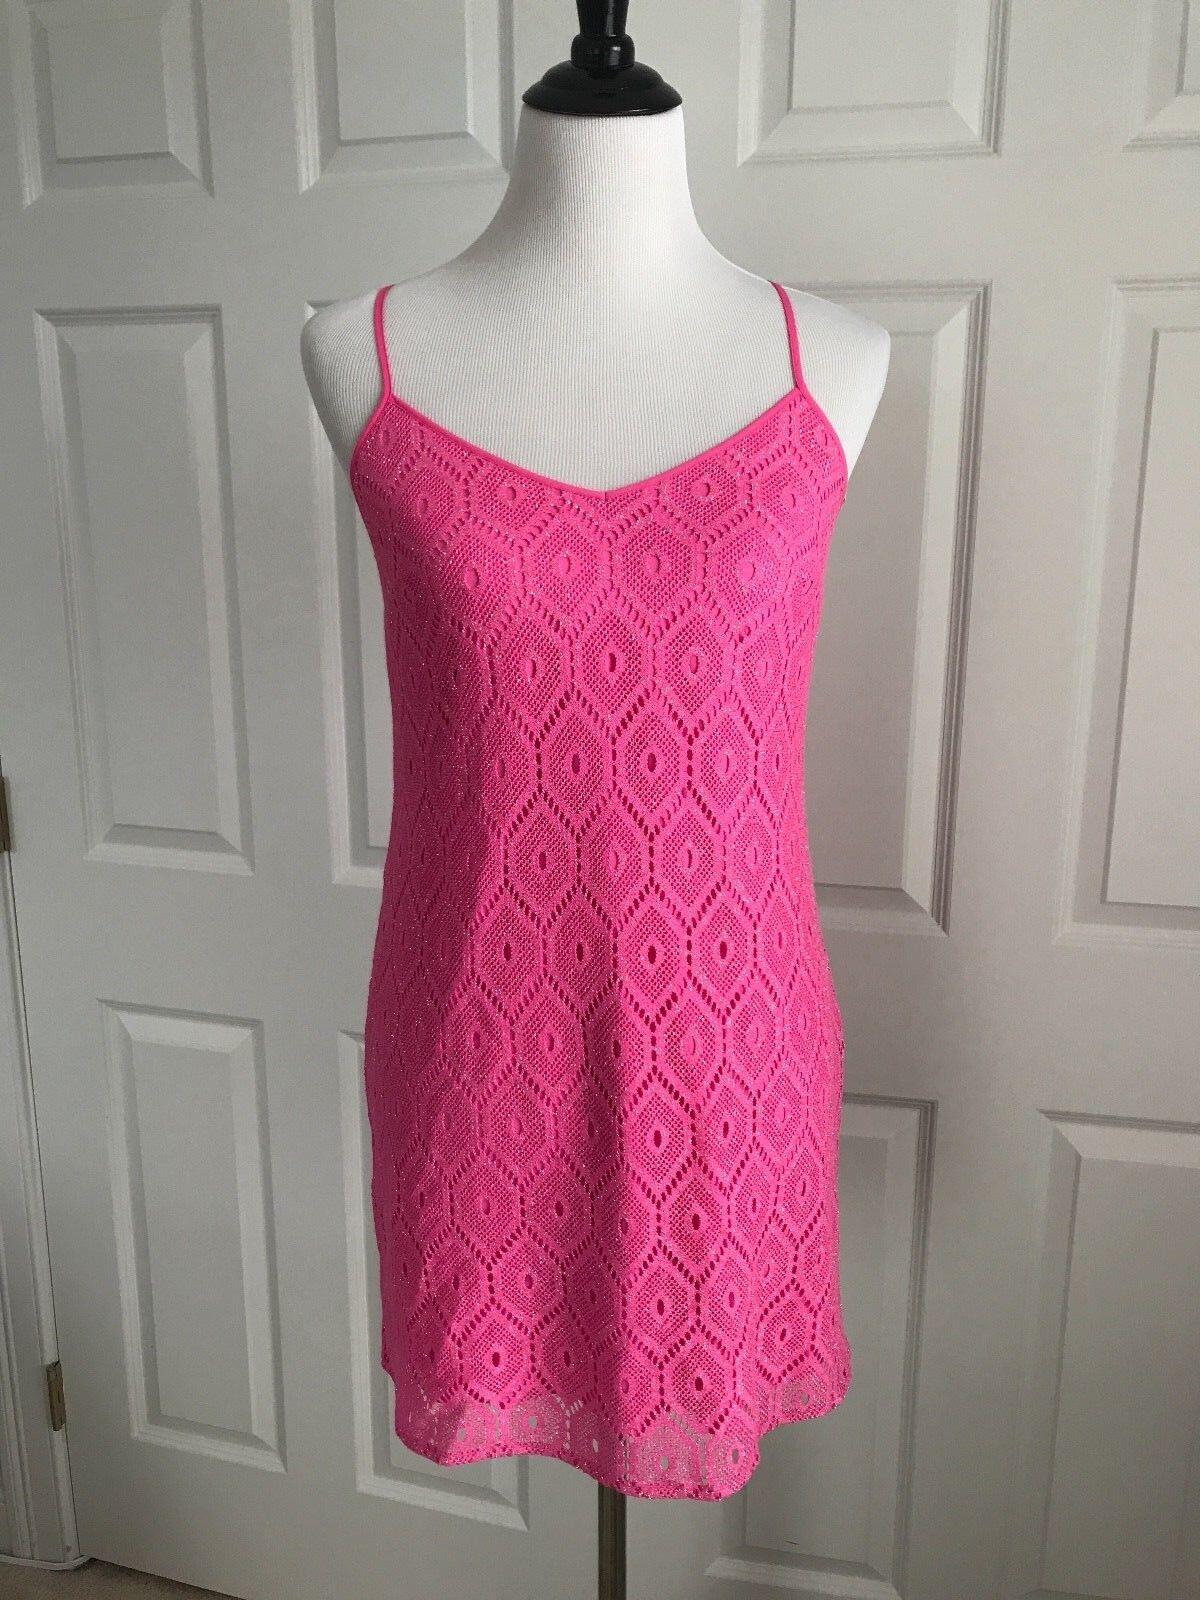 Lilly Pulitzer damen Dress Dusk Pop Rosa Metallic Sparkle Lace 10907 XS